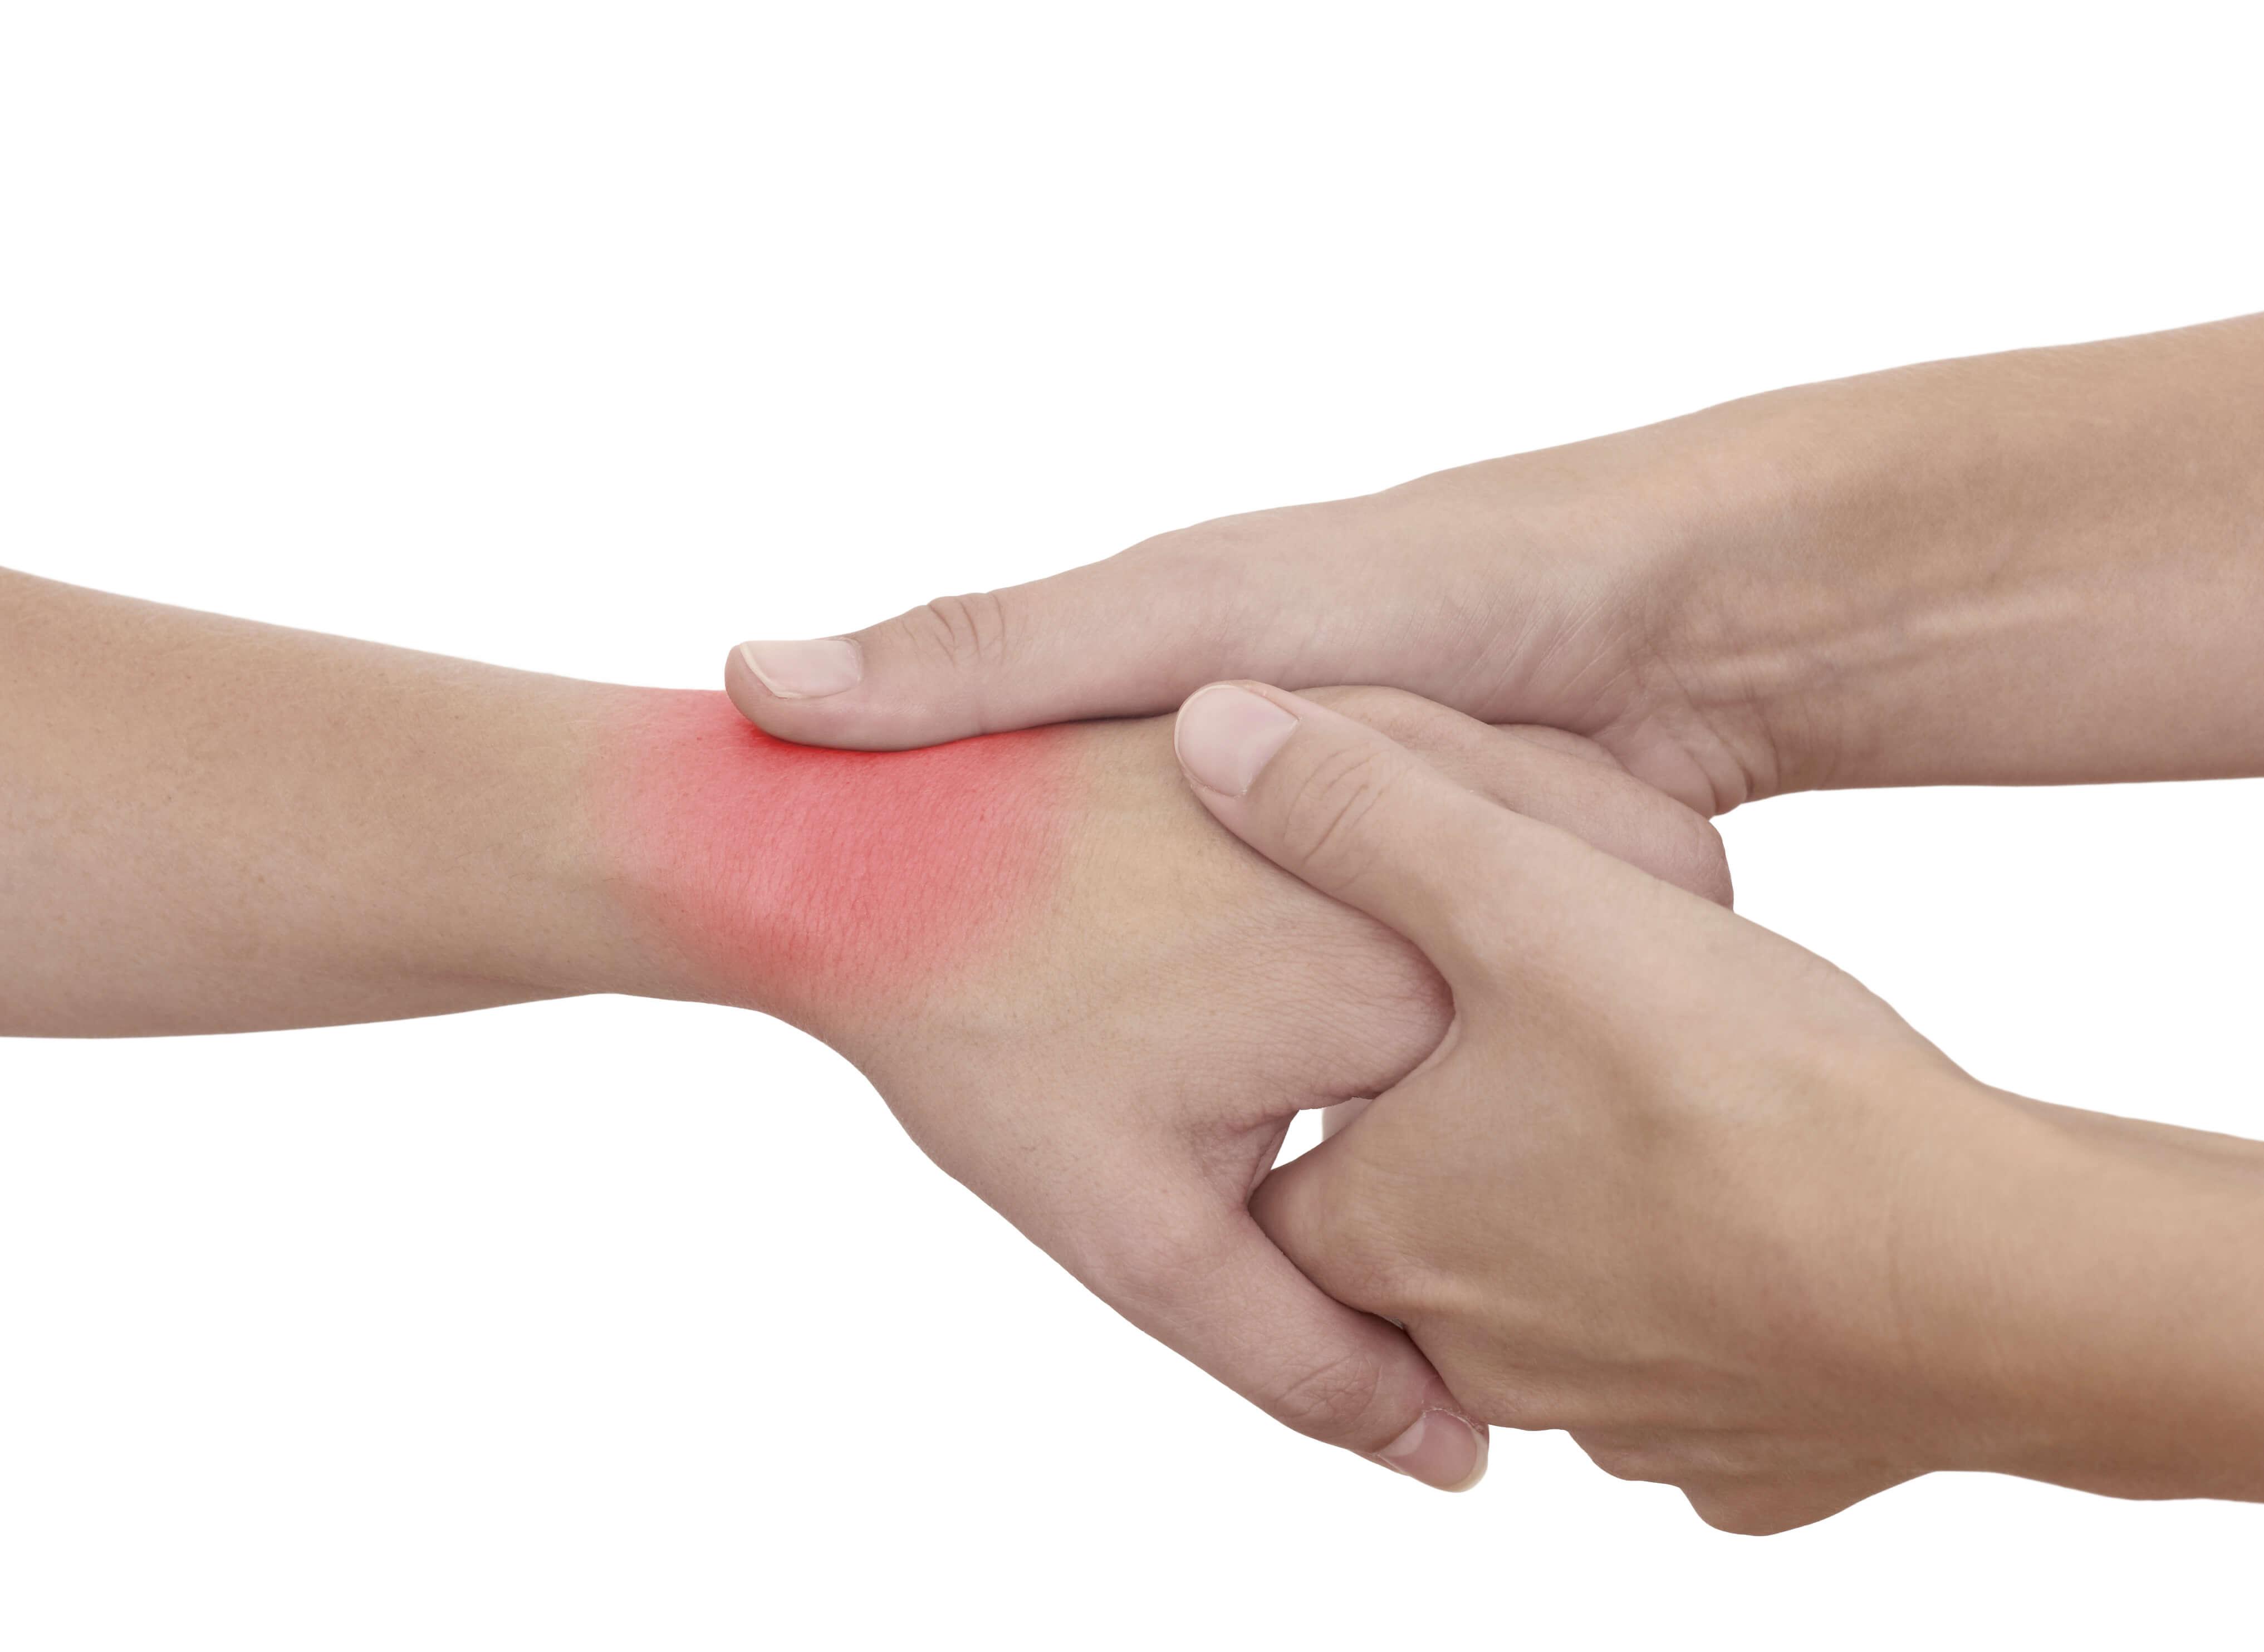 Handgelenke tun weh Ernährung bei Arthritis